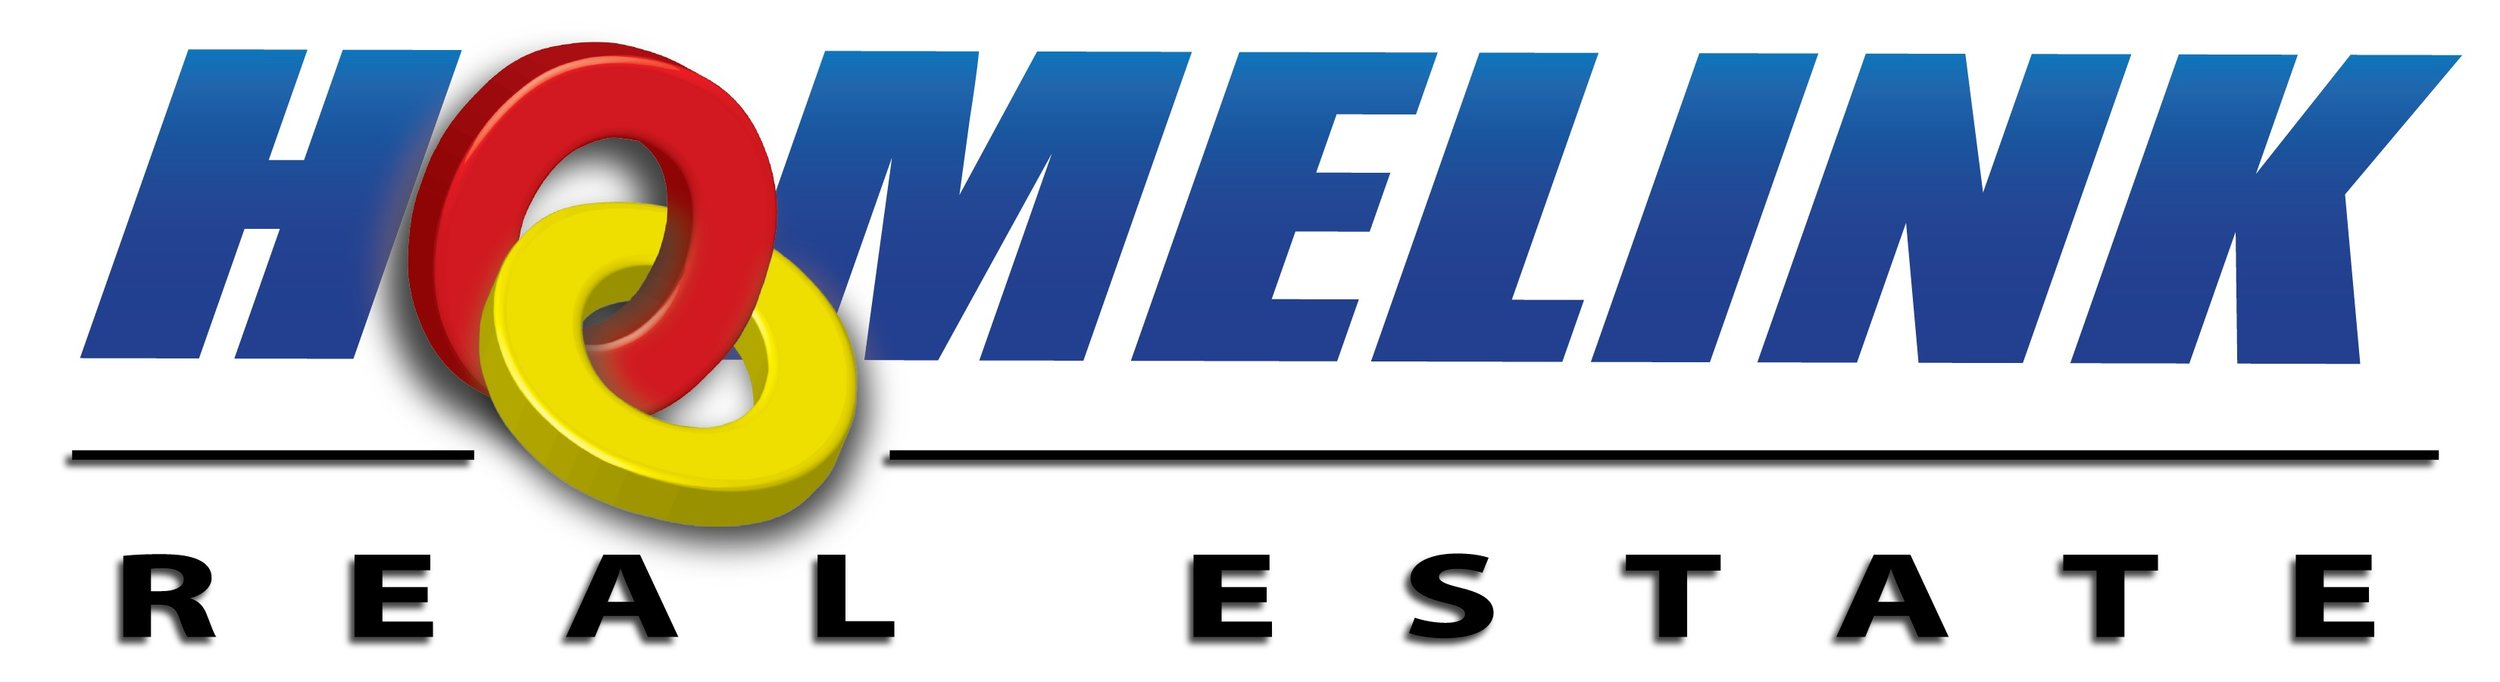 Homelink_Real_Estate Logo banner.jpg